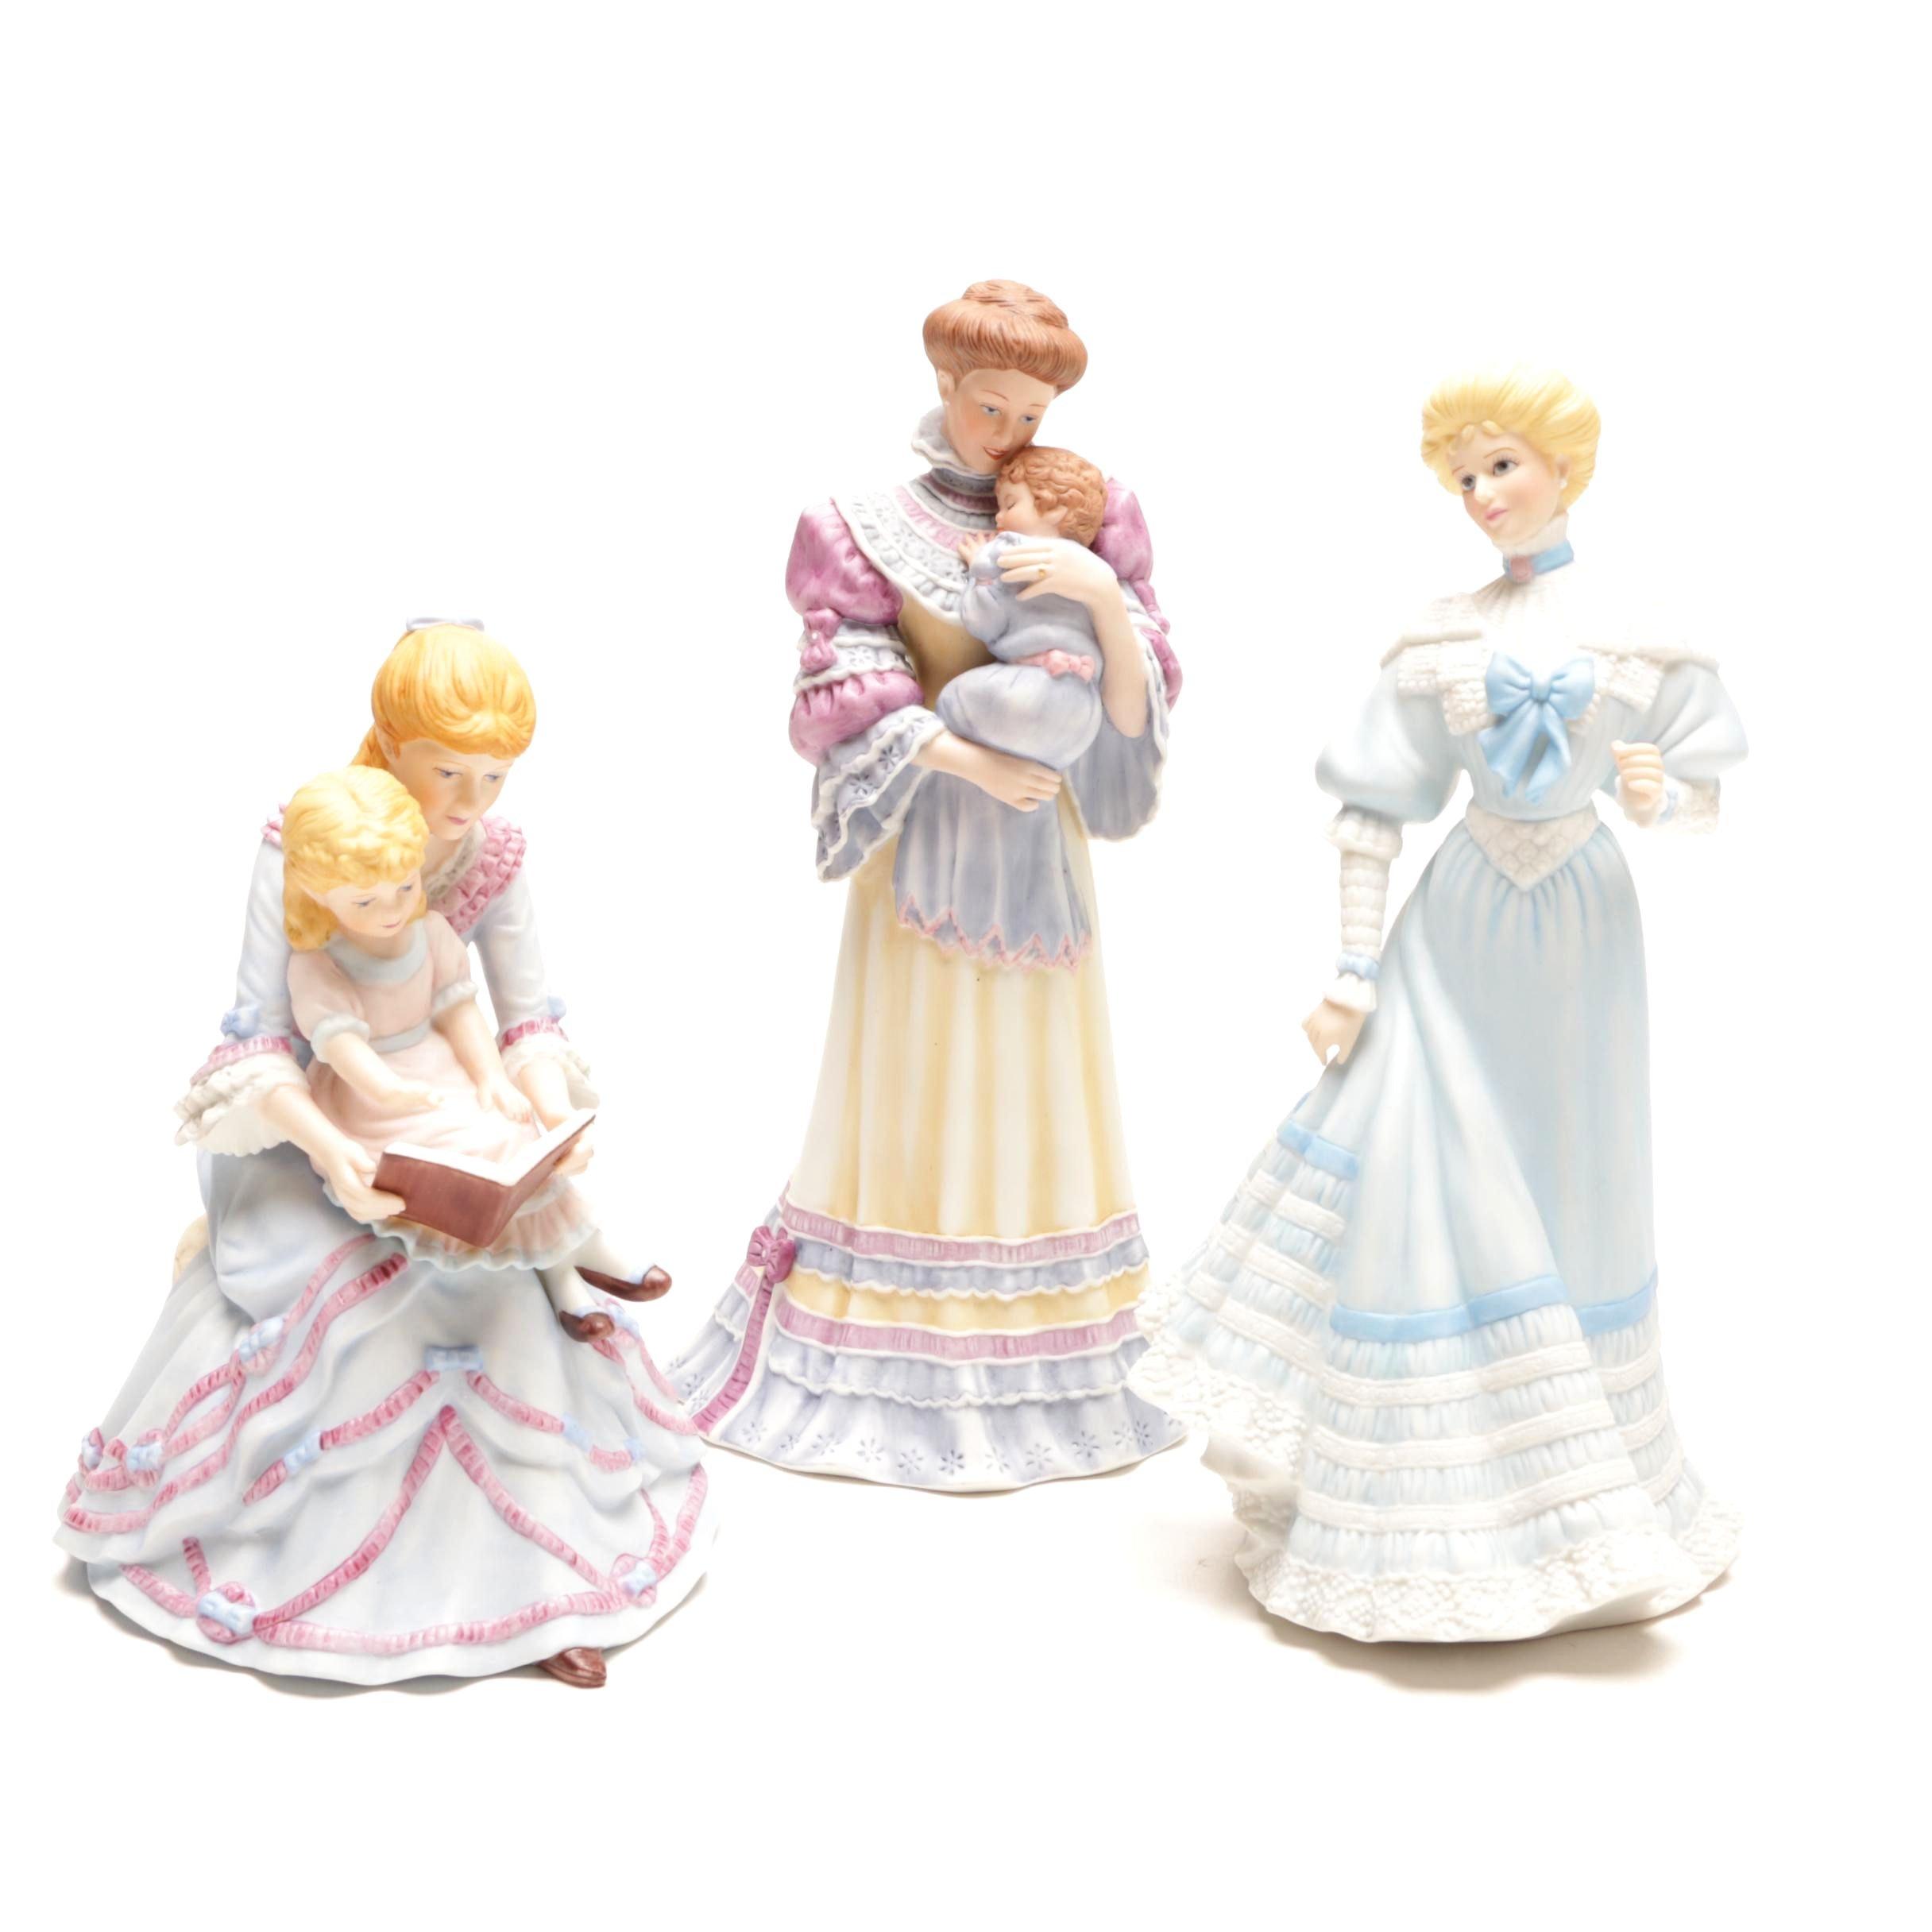 Decorative Porcelain Figurines Featuring Gorham and Lenox